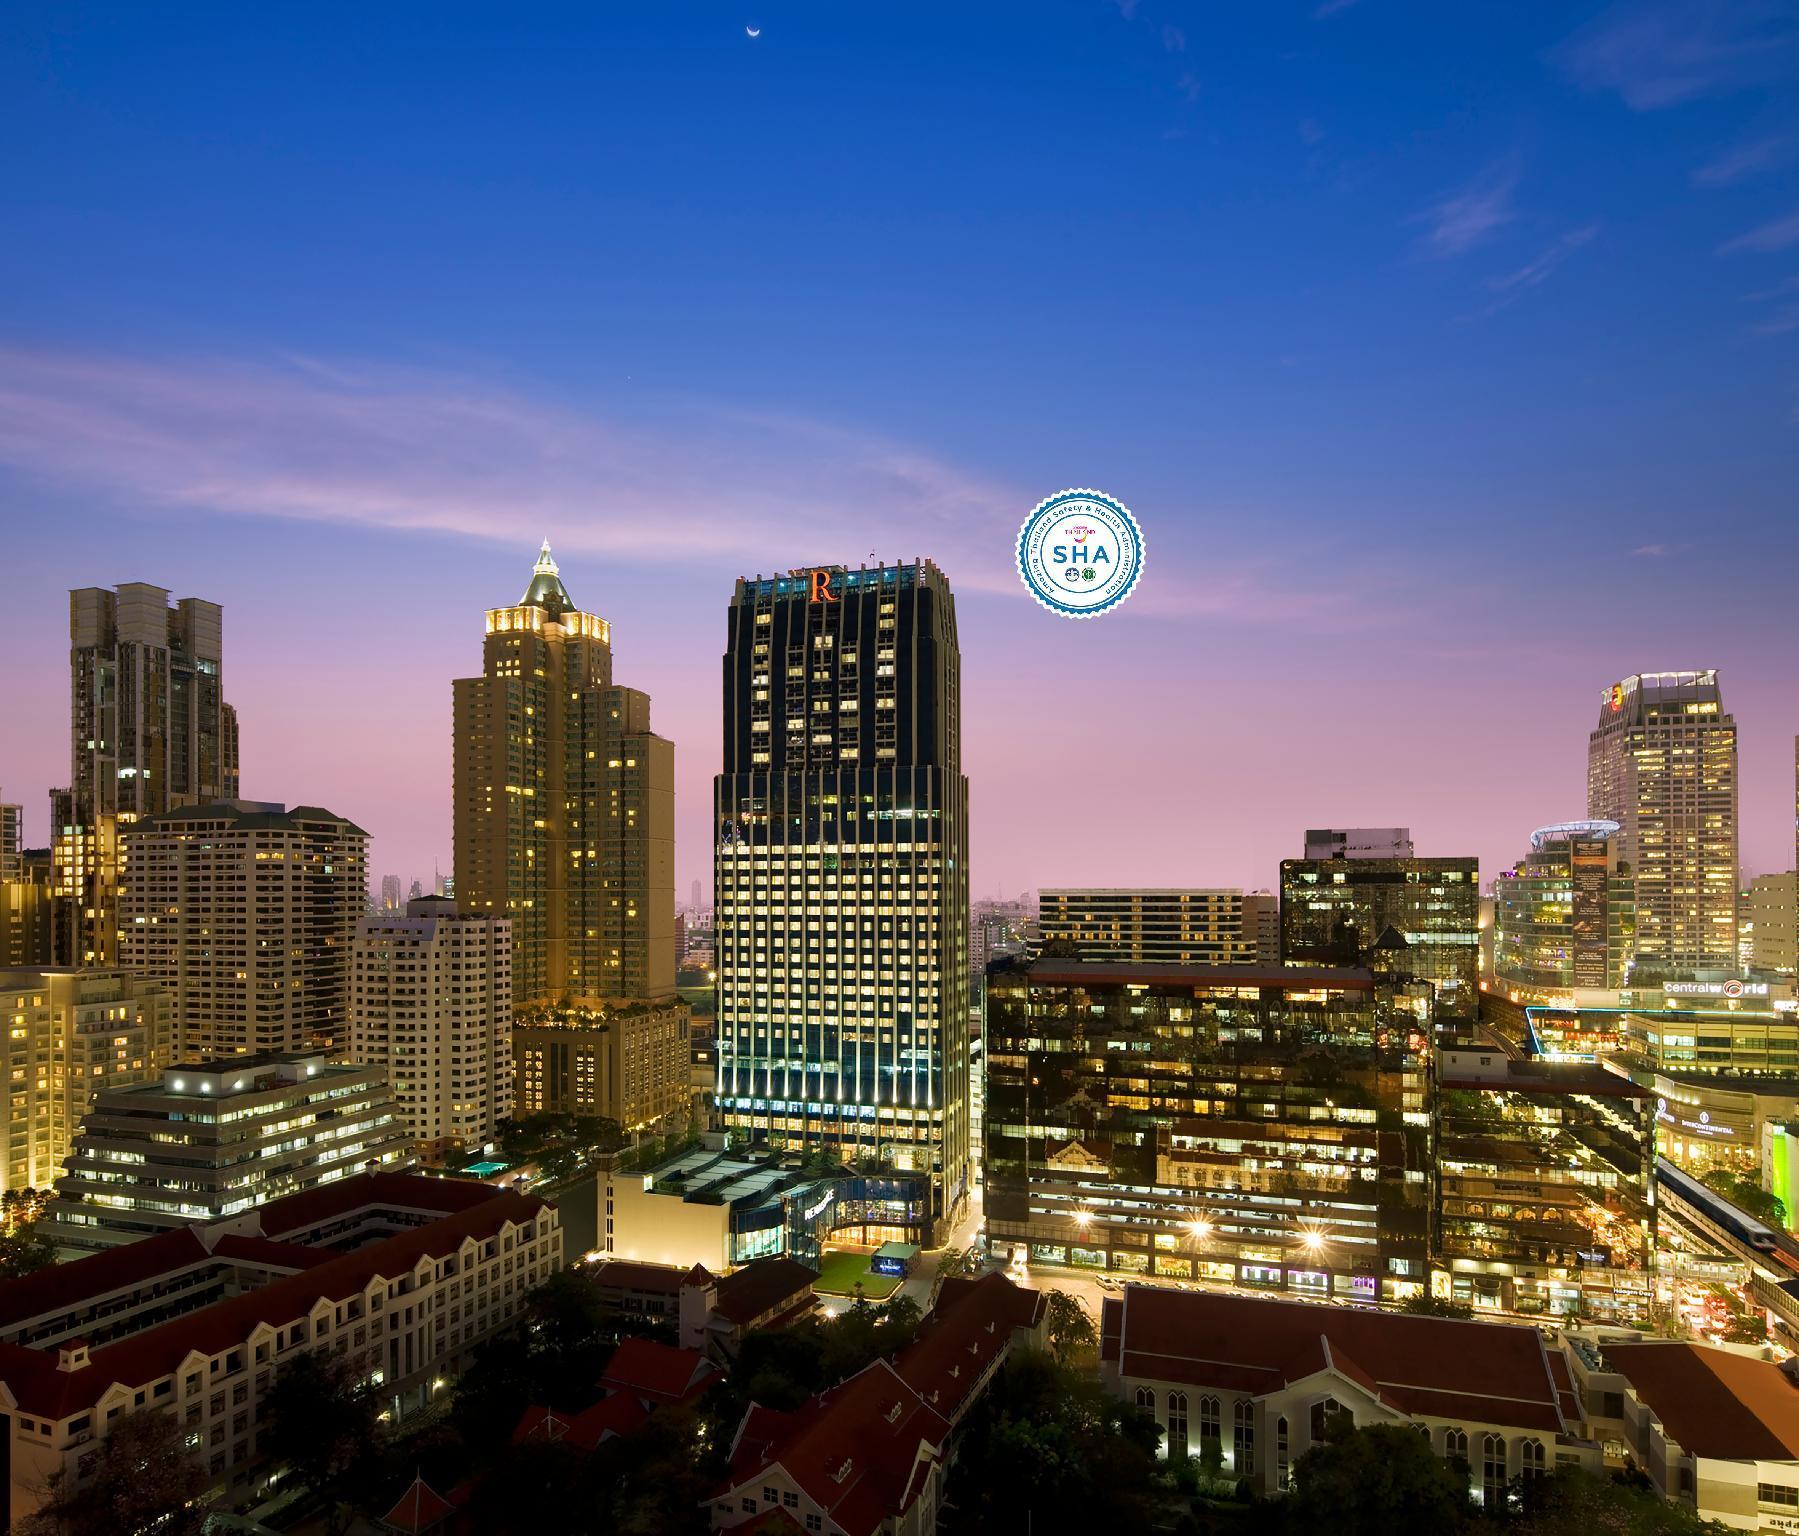 Renaissance Bangkok Ratchaprasong Hotel (SHA Certified)